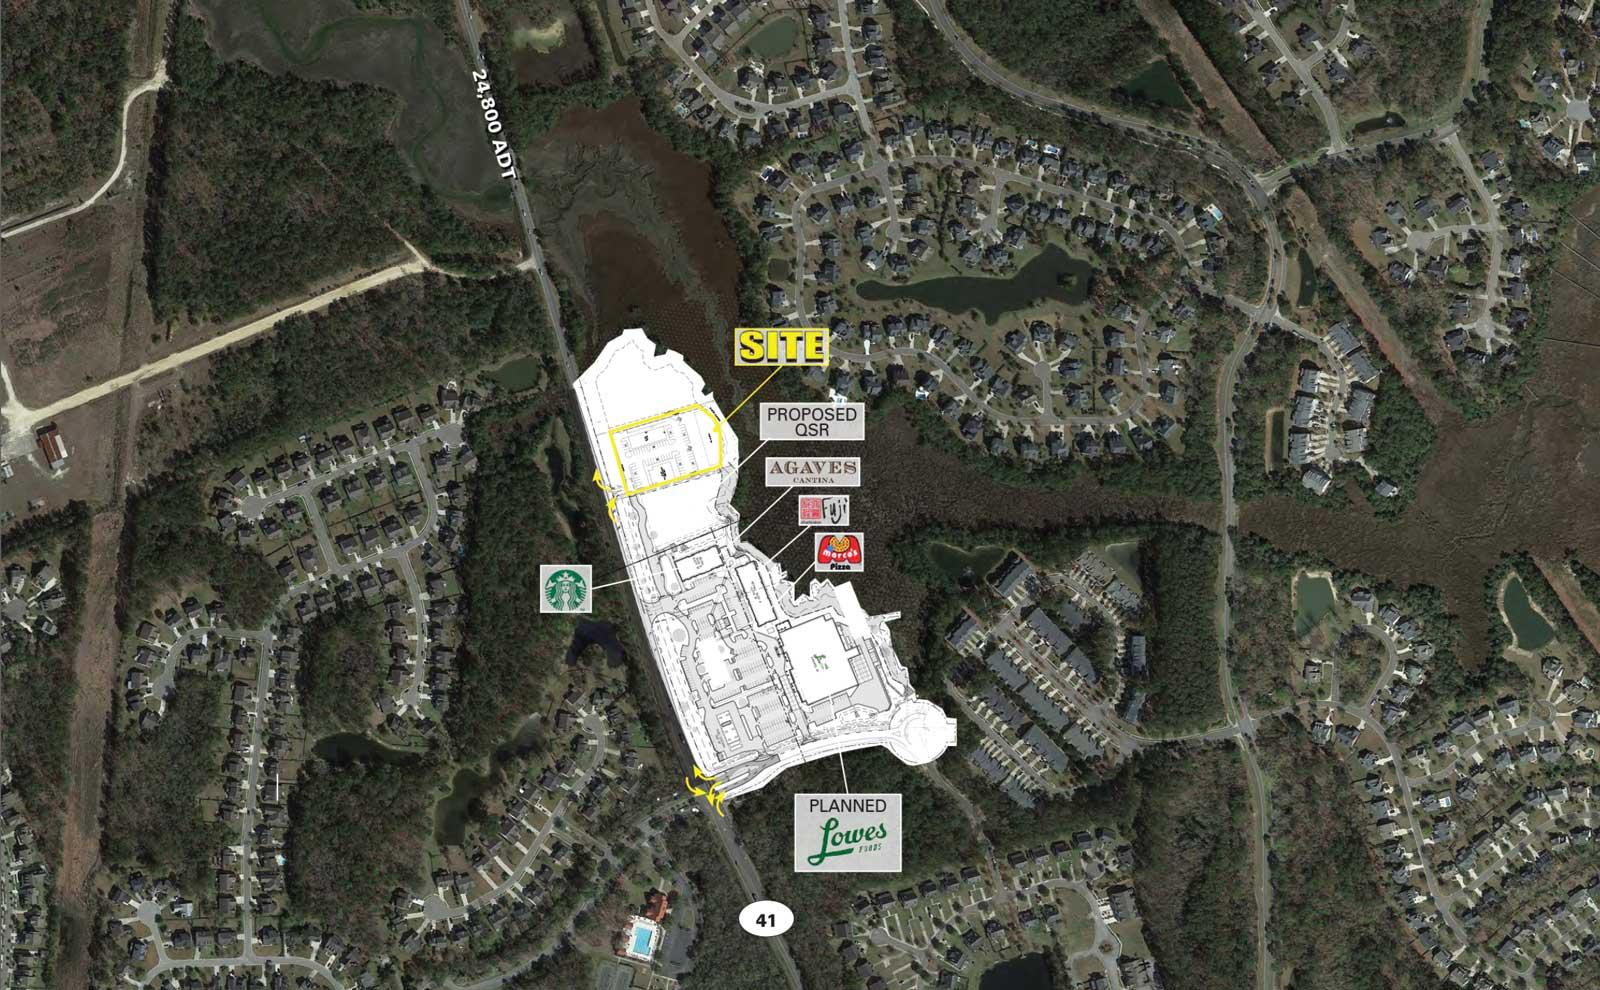 Mt. Pleasant Real Estate Development at Mill Creek